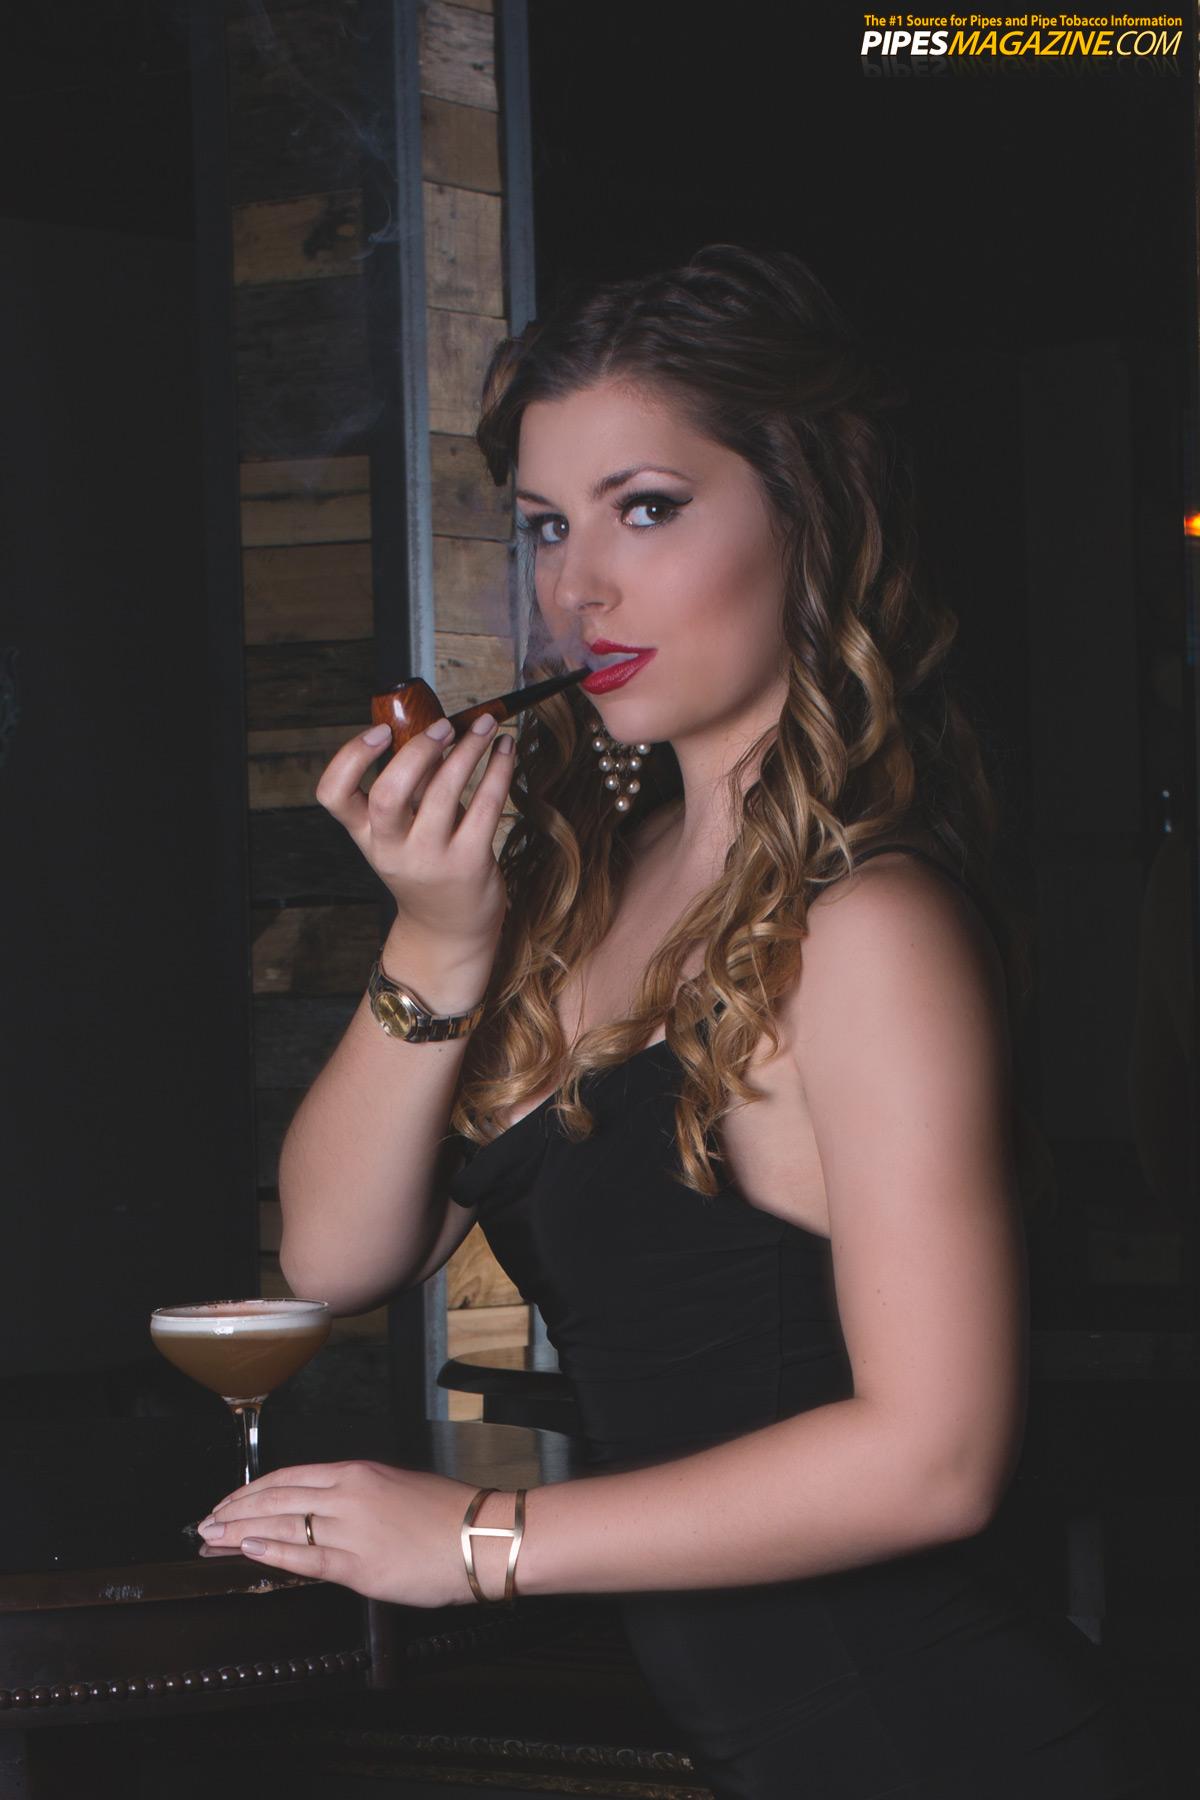 pipe-babe-montana-smokes-a-dunhill-pipe-06.jpg